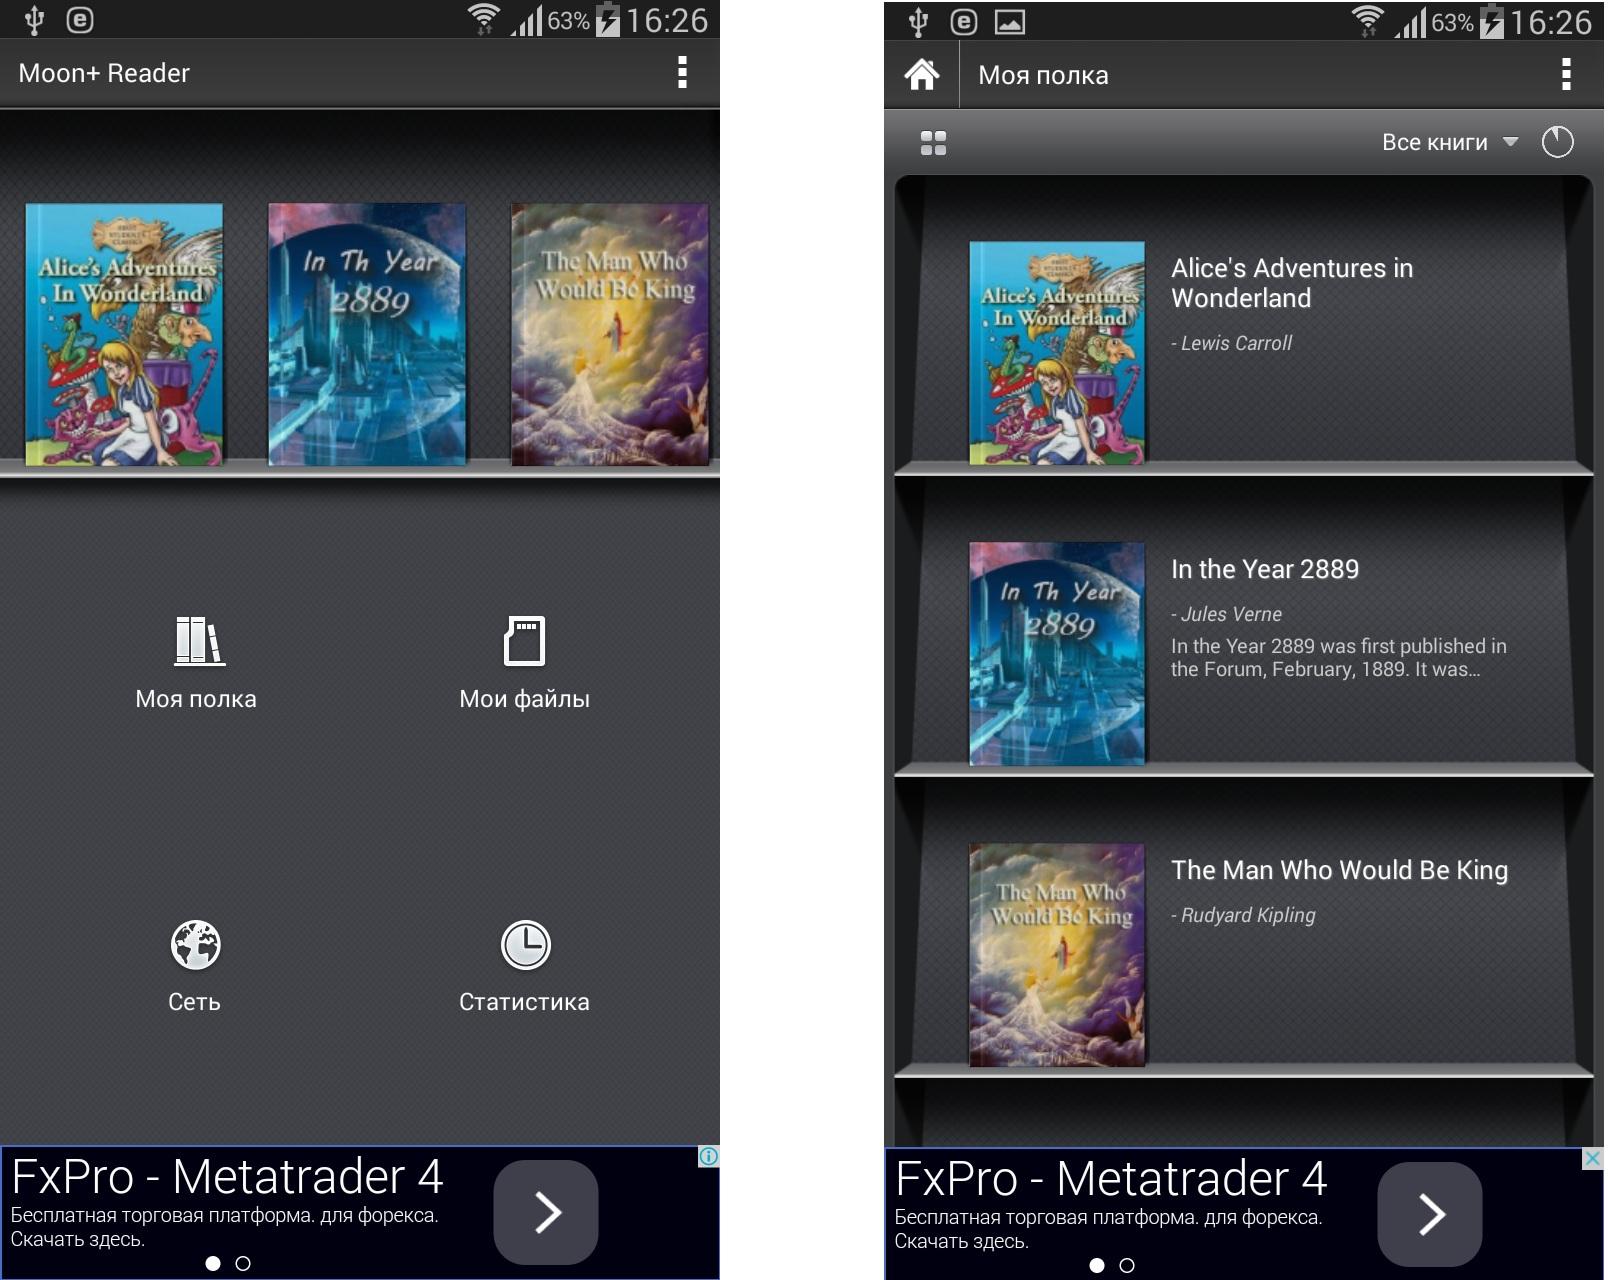 ТОП-20 приложений для Android - Moon+ Reader